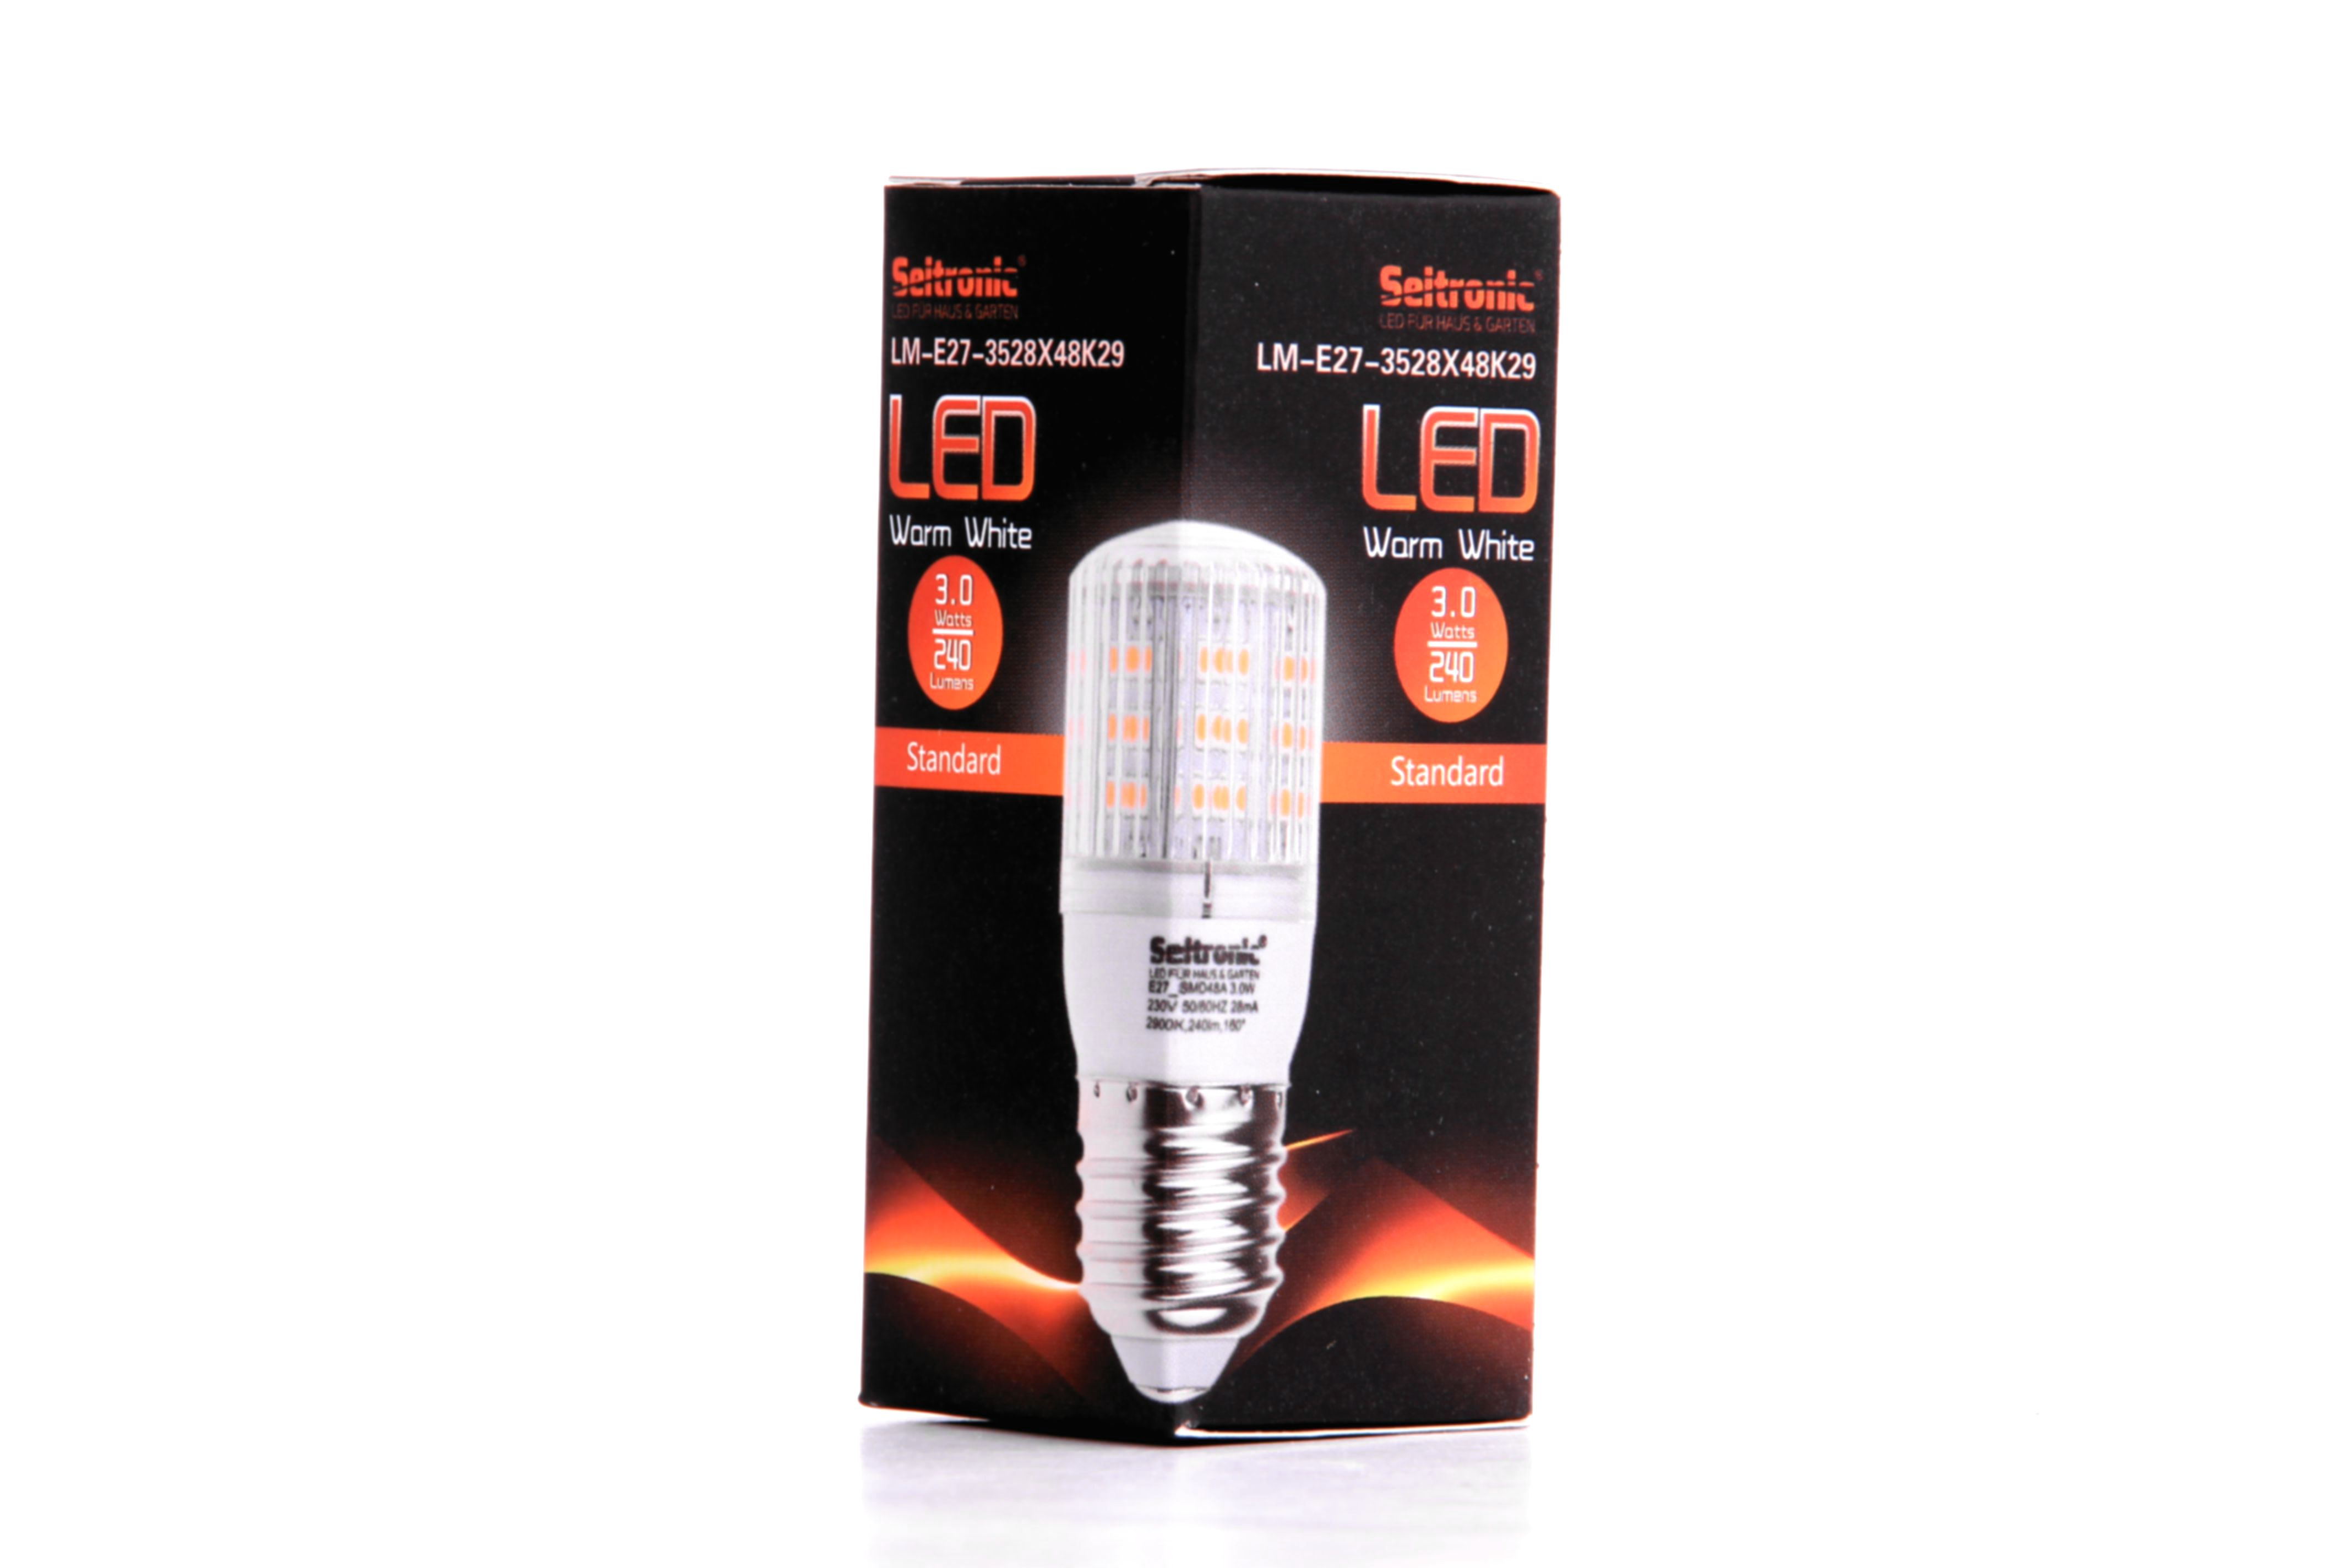 led_lampe_seitronic_e27_warm Luxus Led Lampe 3 Watt Dekorationen